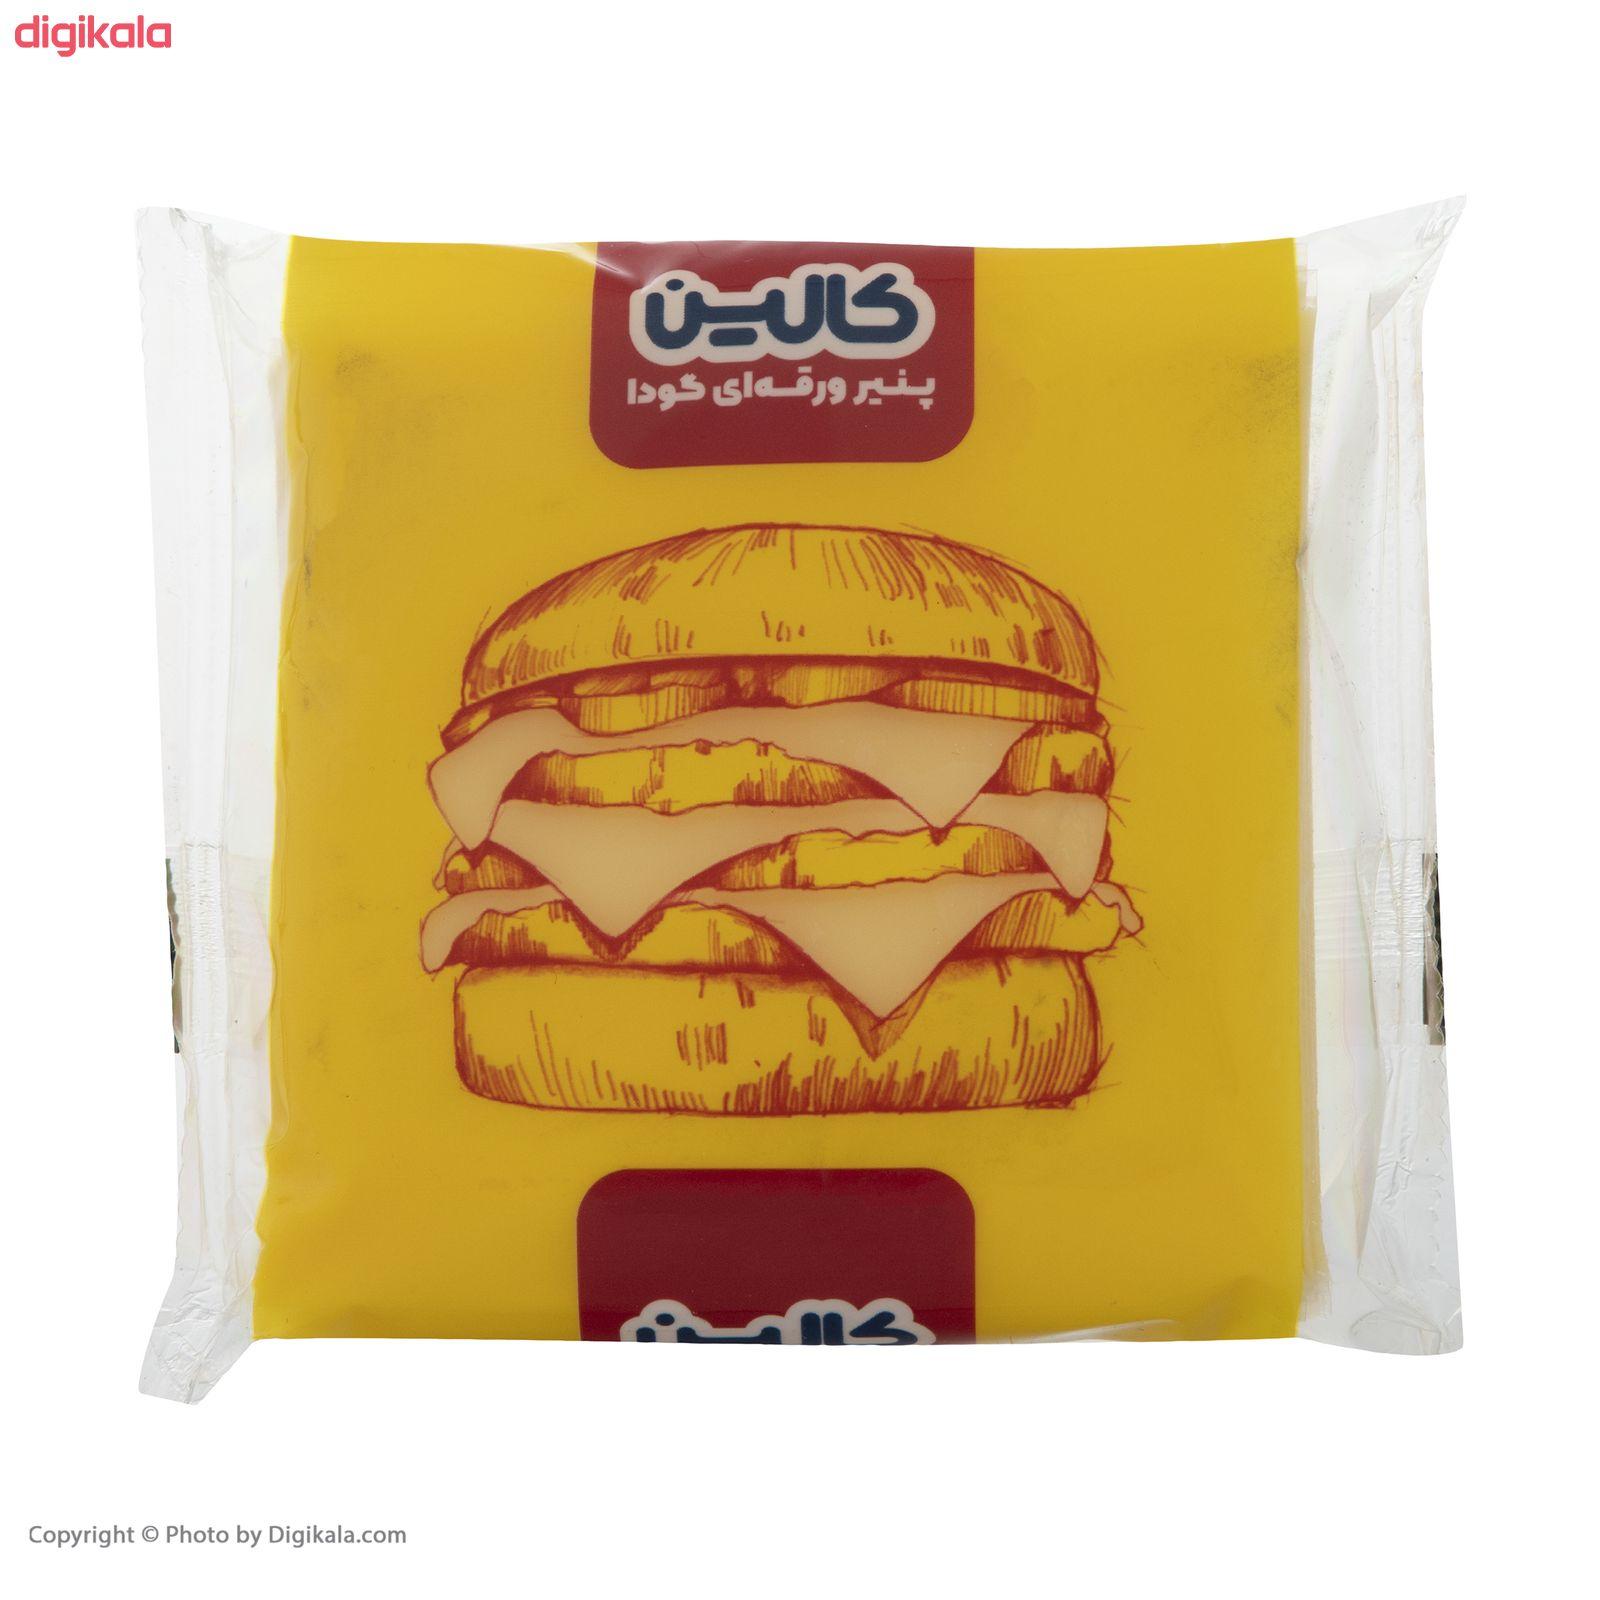 پنیر گودا ورقهای کالین - 180 گرم main 1 3